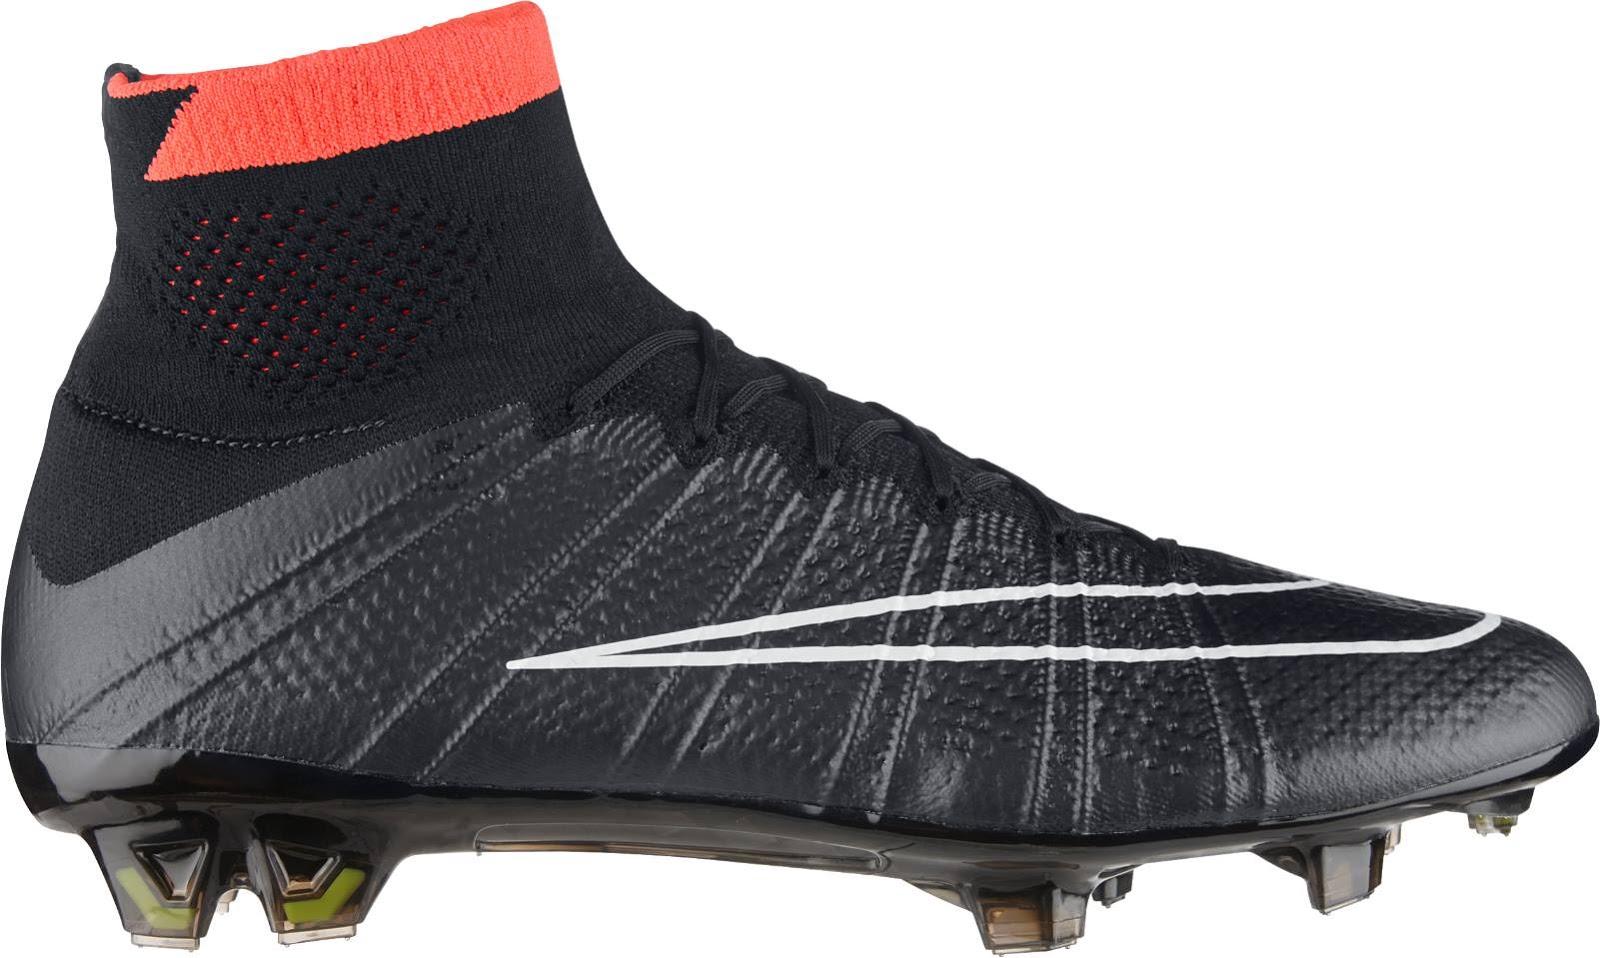 Nike Mercurial Superfly 2014 Blackout Boot Released ...  Nike Mercurial ...